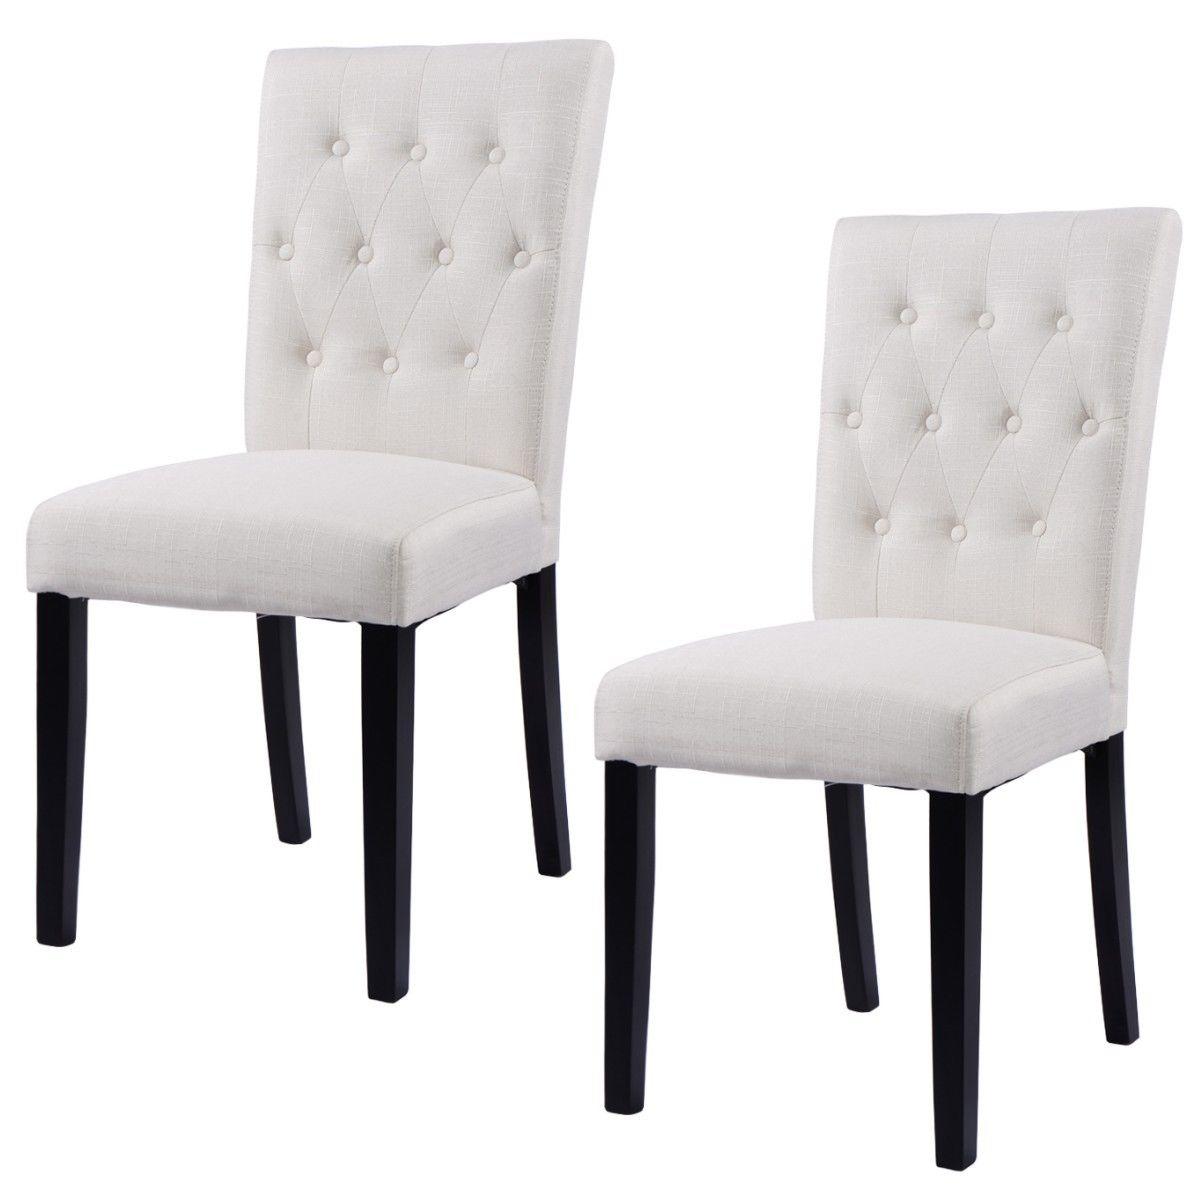 купить Giantex Set of 2pcs Fabric Dining Chair Armless Chair Modern Home Kitchen Living Room Furniture HW52778BE по цене 5439.12 рублей